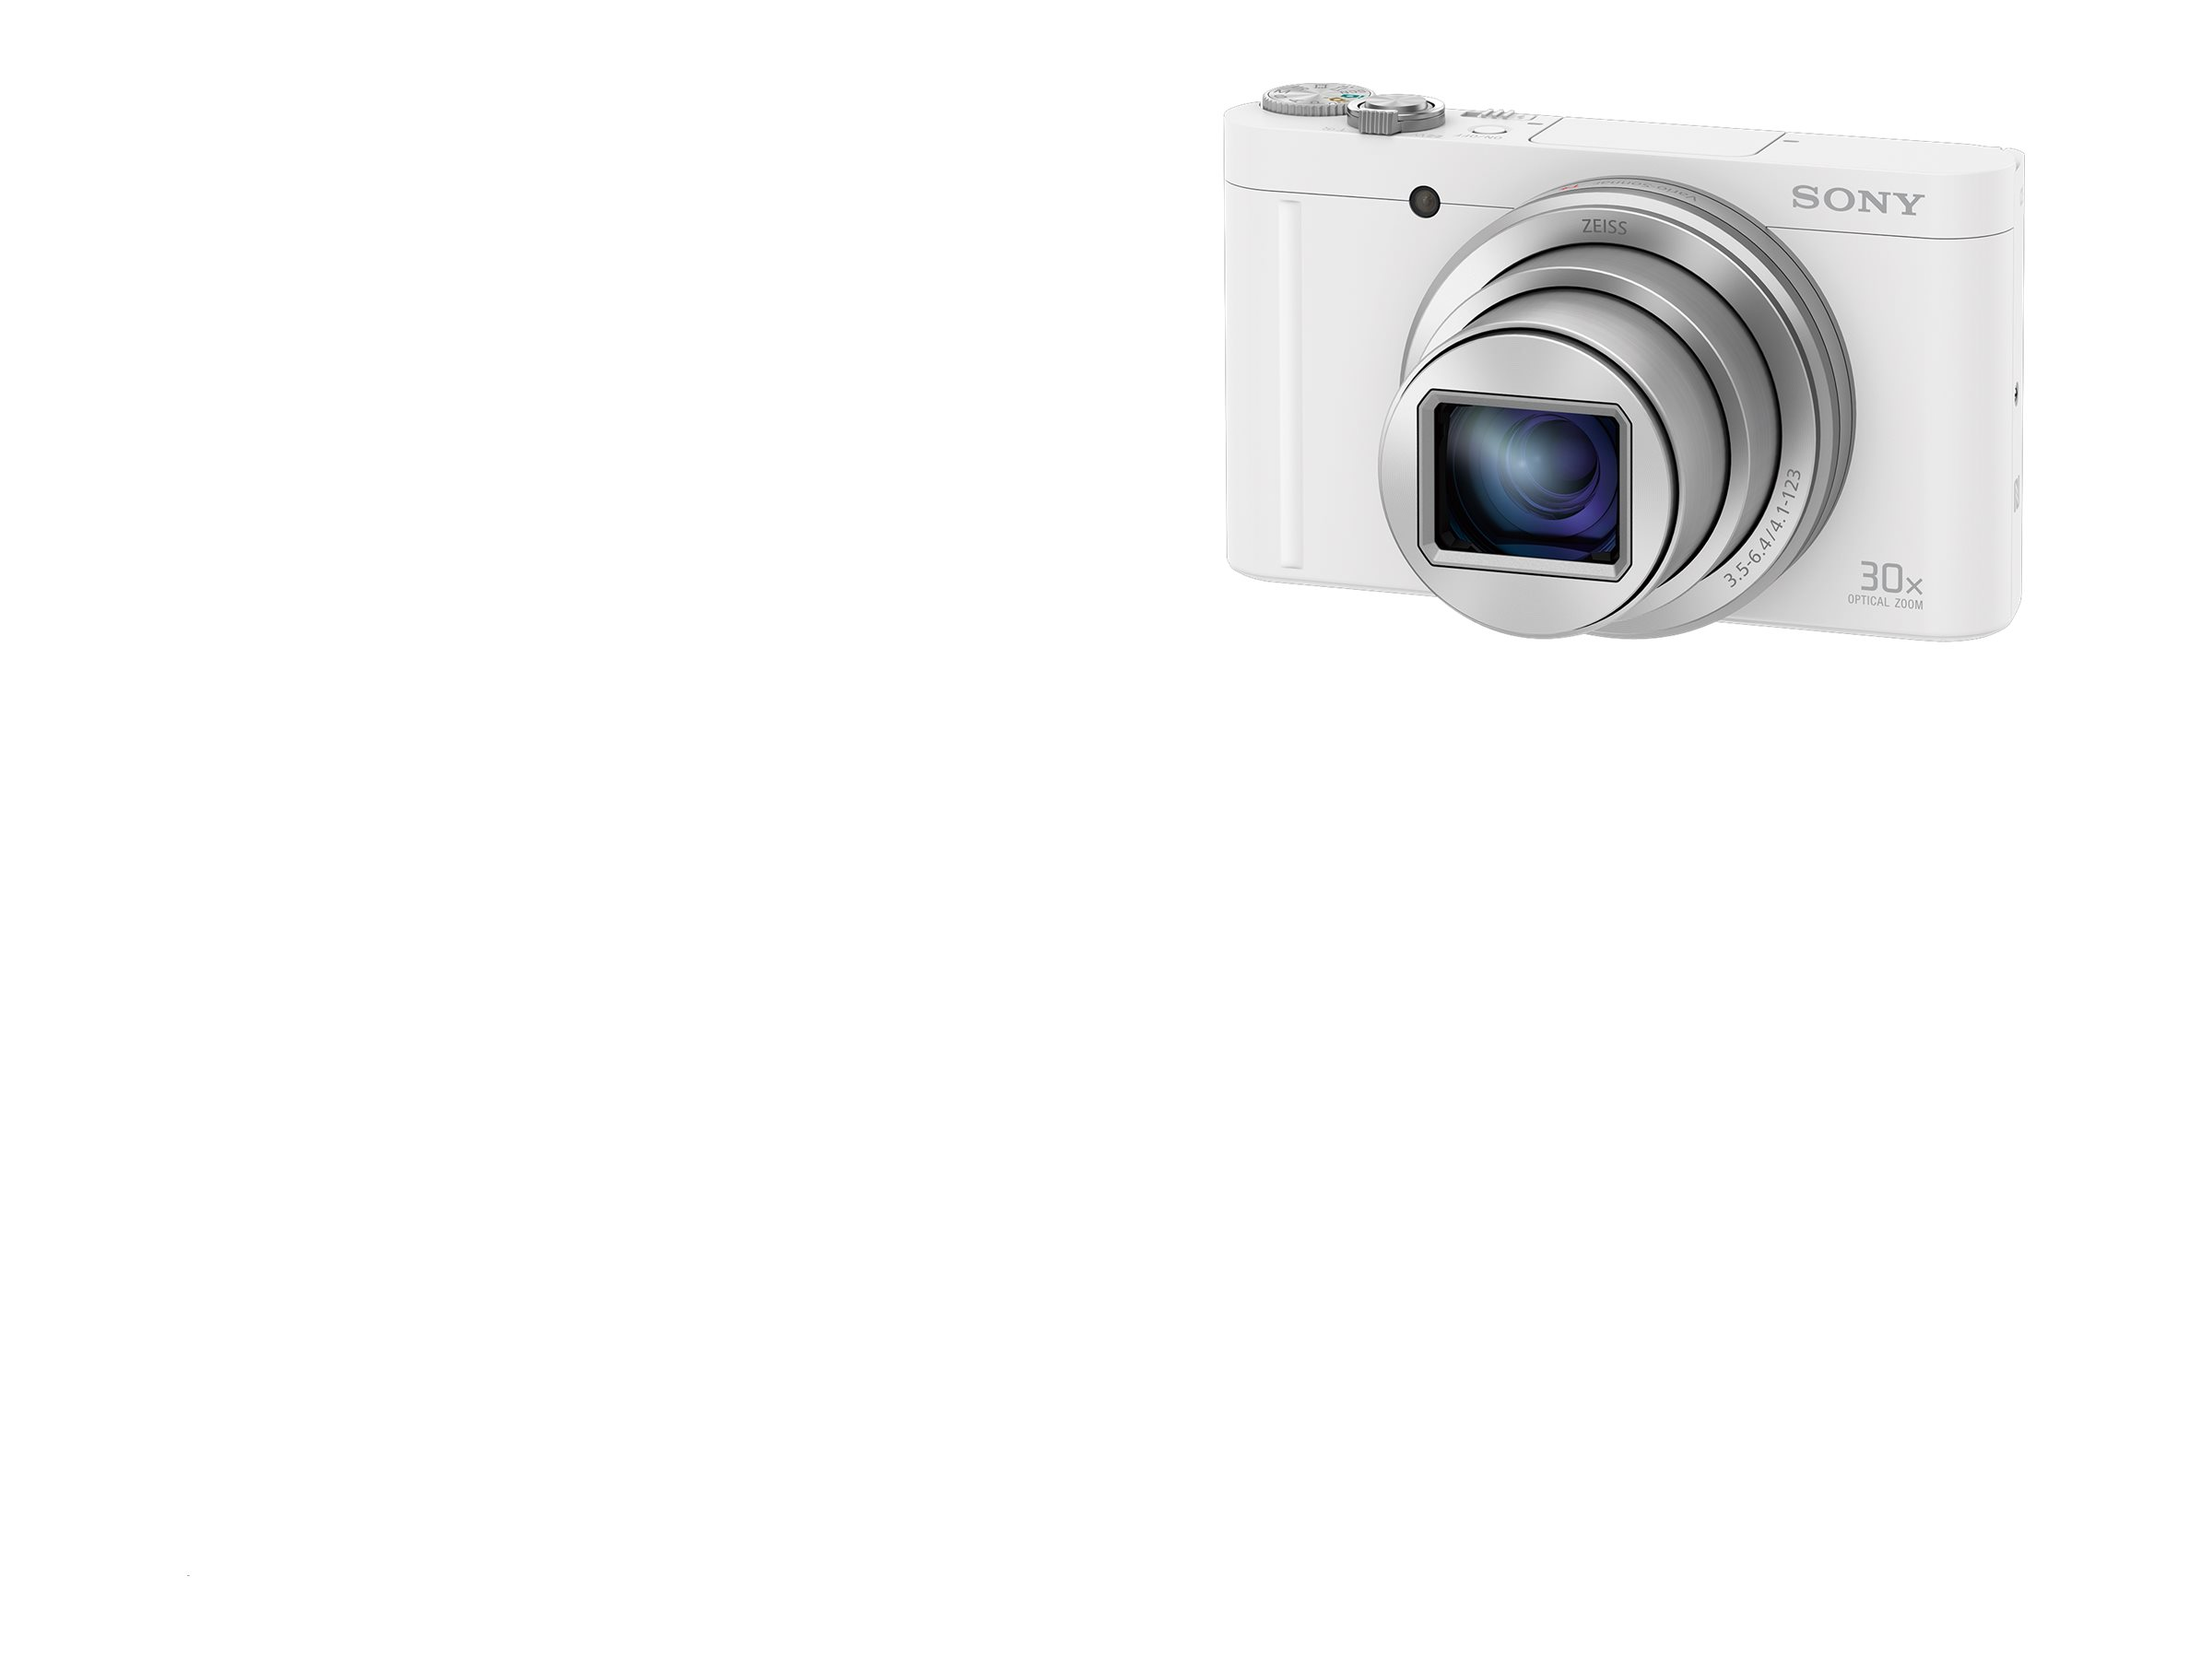 Sony Cyber-shot DSC-WX500 - Digitalkamera - Kompaktkamera - 18.2 MPix - 30x optischer Zoom - ZEISS